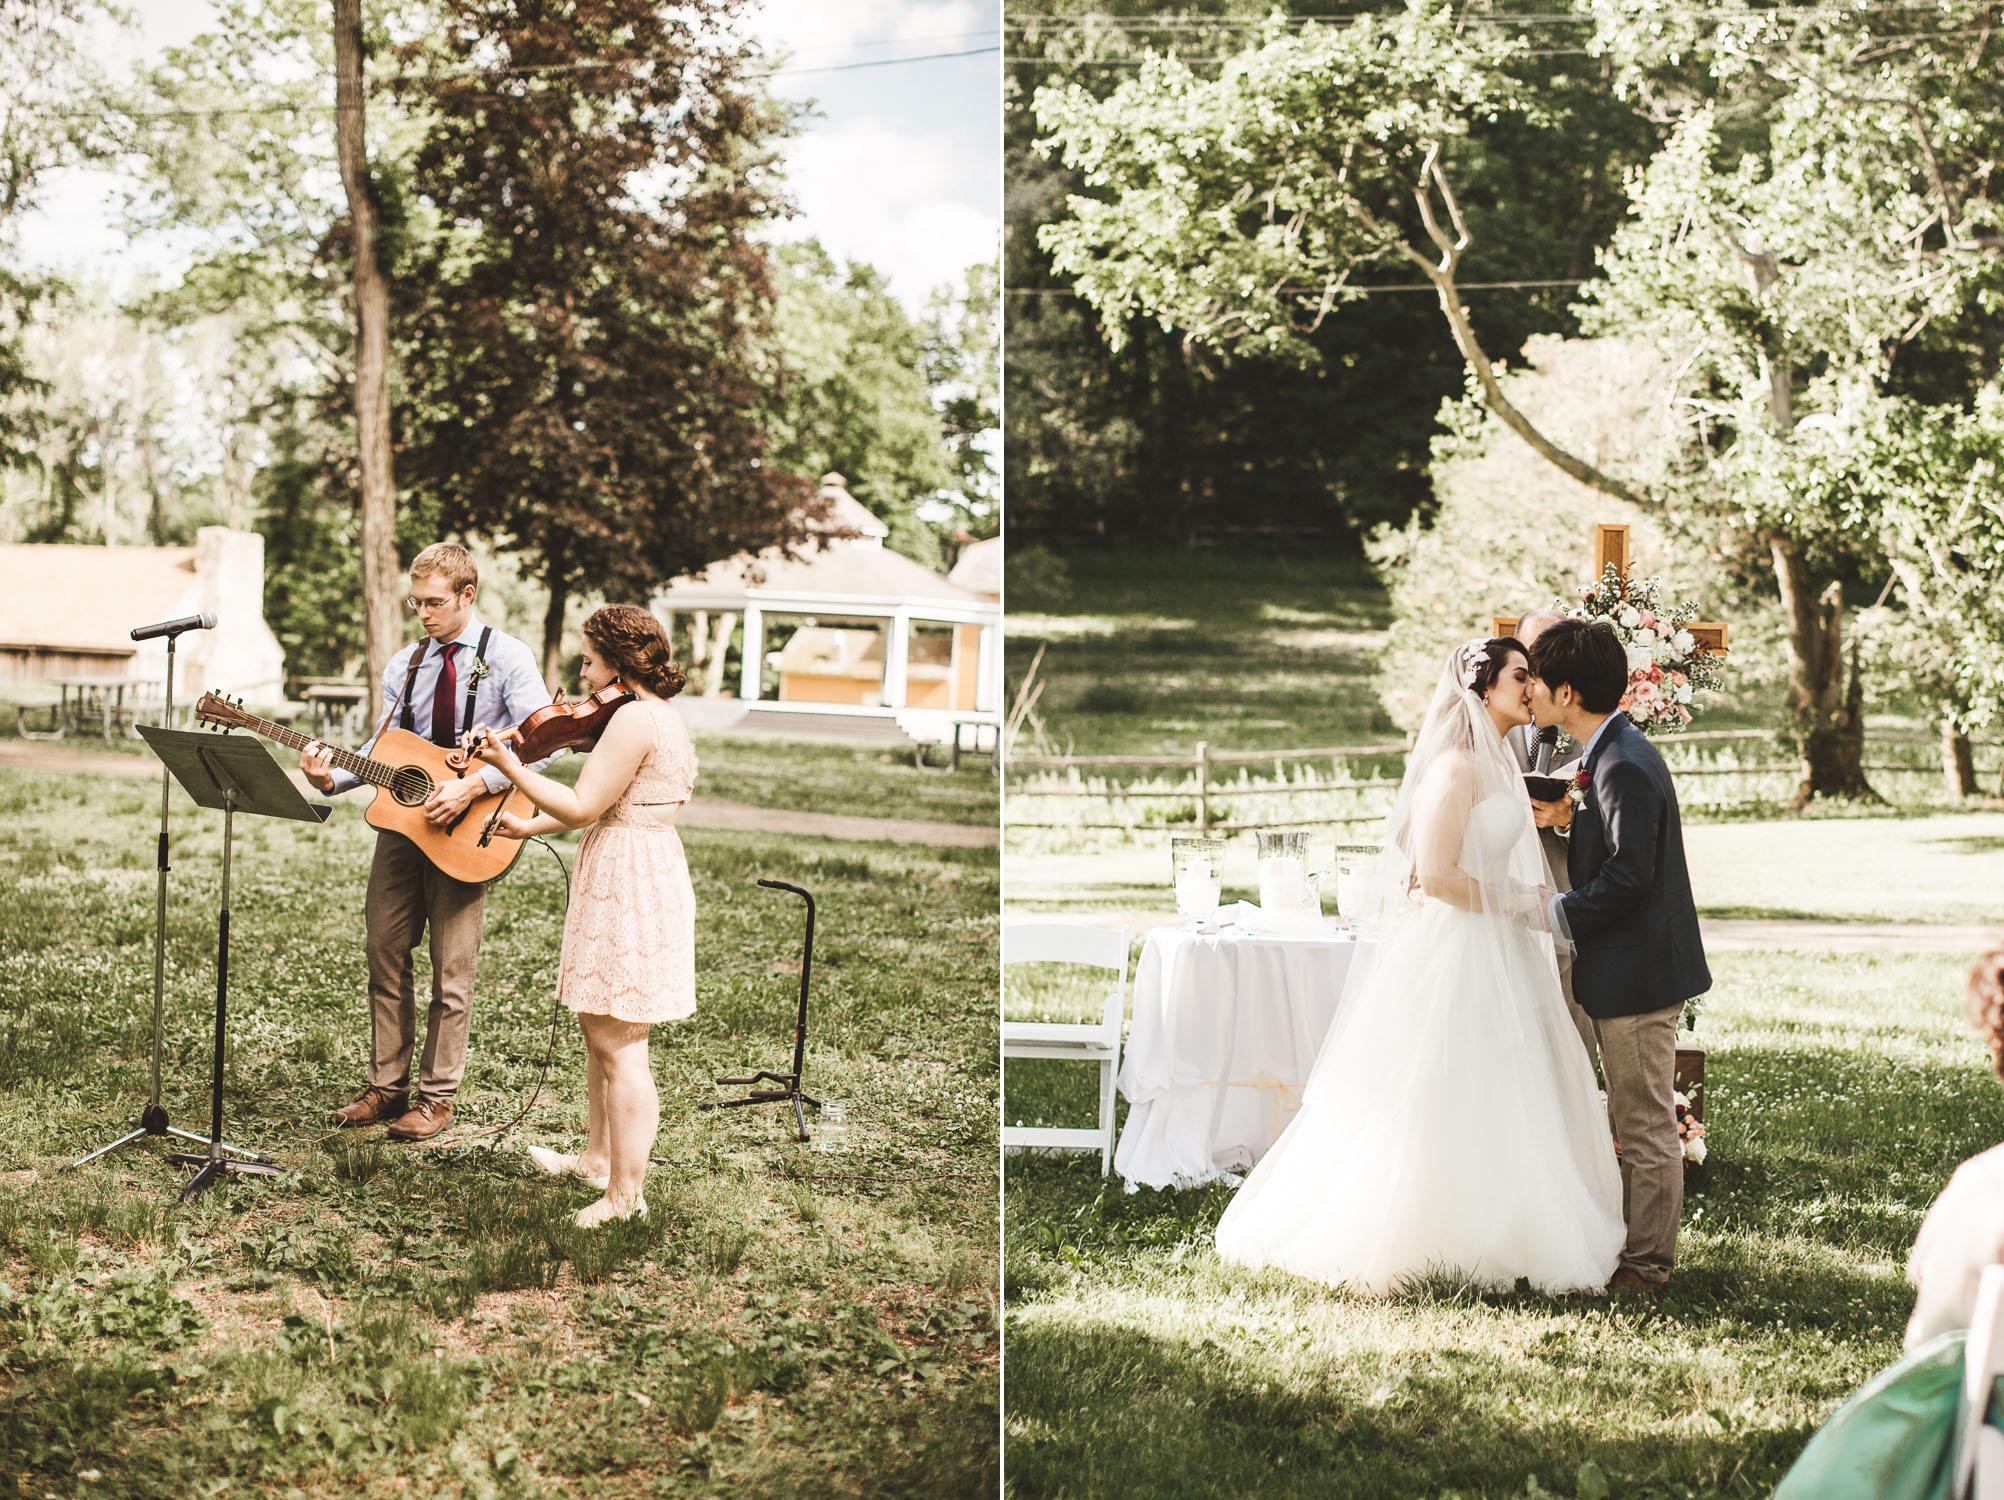 Waterloo-Village-Artistic-Wedding-Photographer-New-York-City-Anthropologie-Style-88 copy.jpg